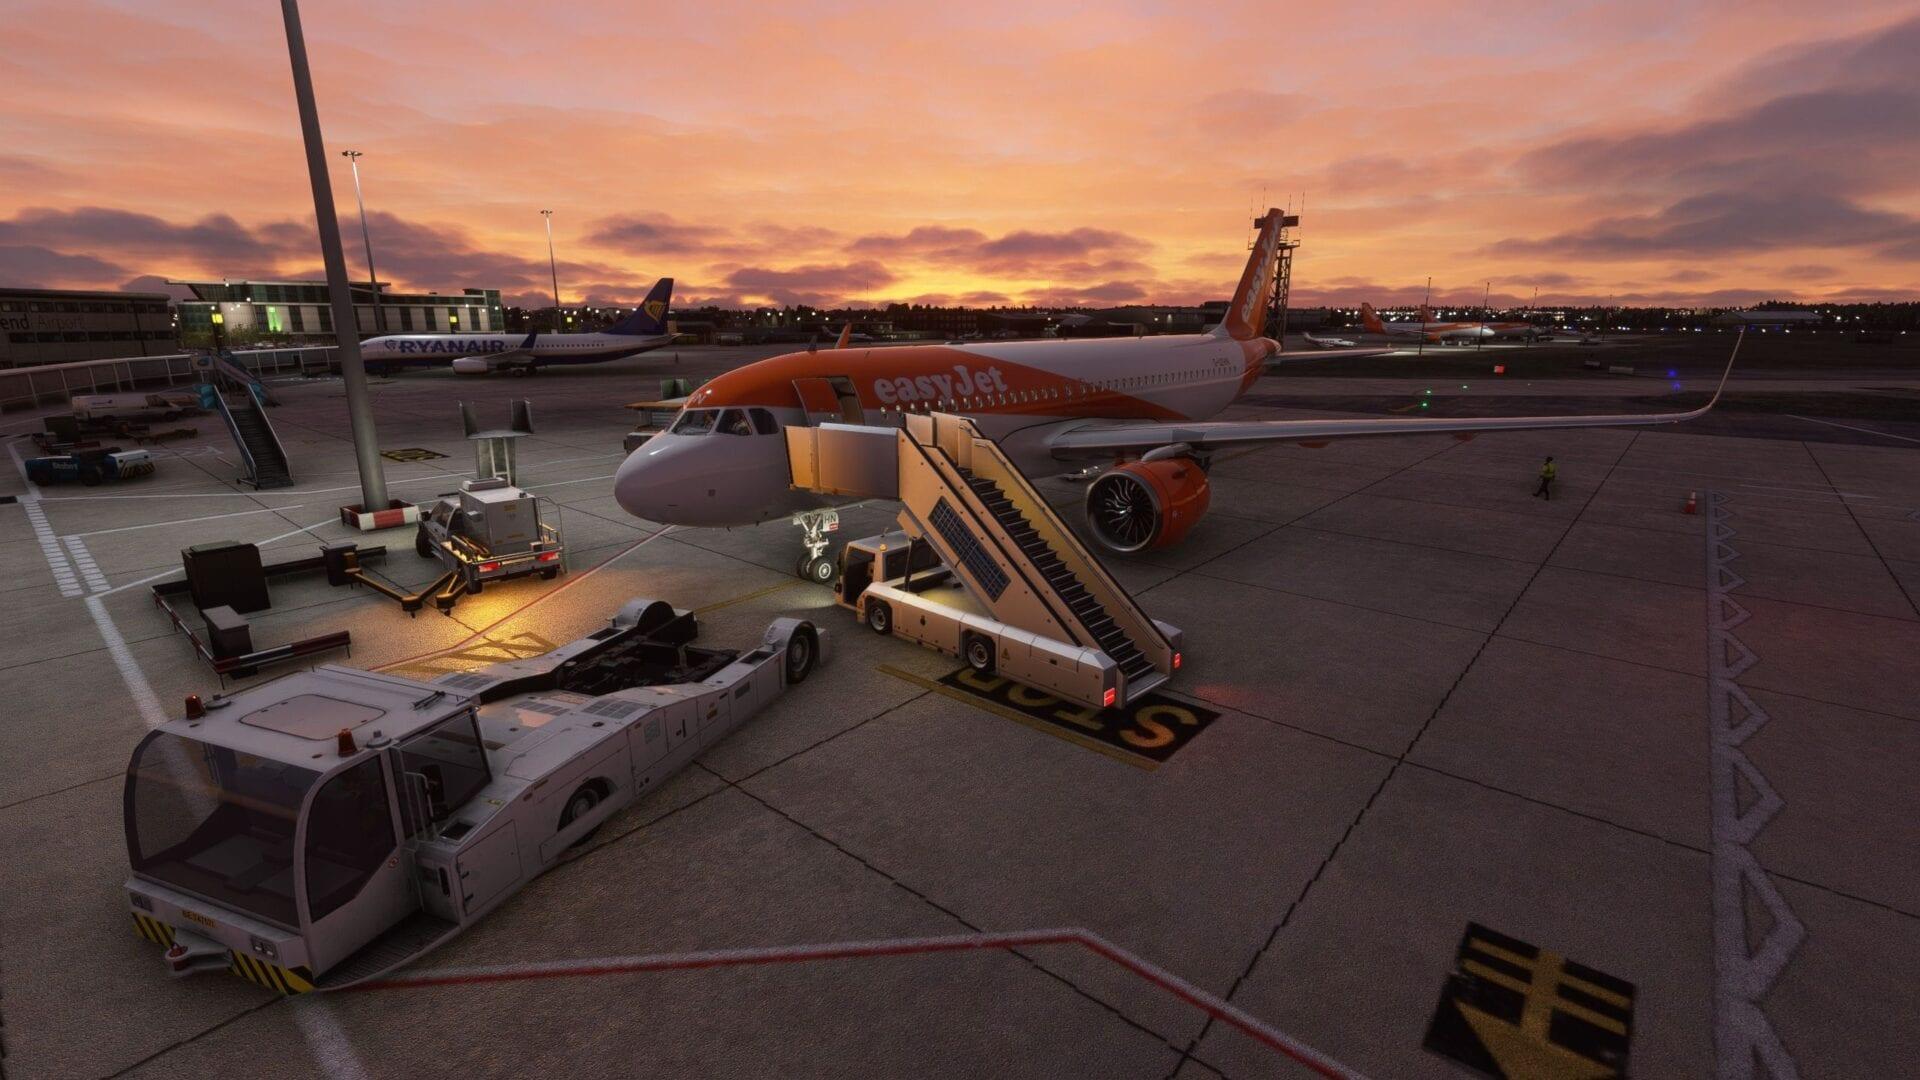 Phil Spencer Talks Microsoft Flight Simulator & Enabling Neighborhood Creators to Make Content material for Video games 1